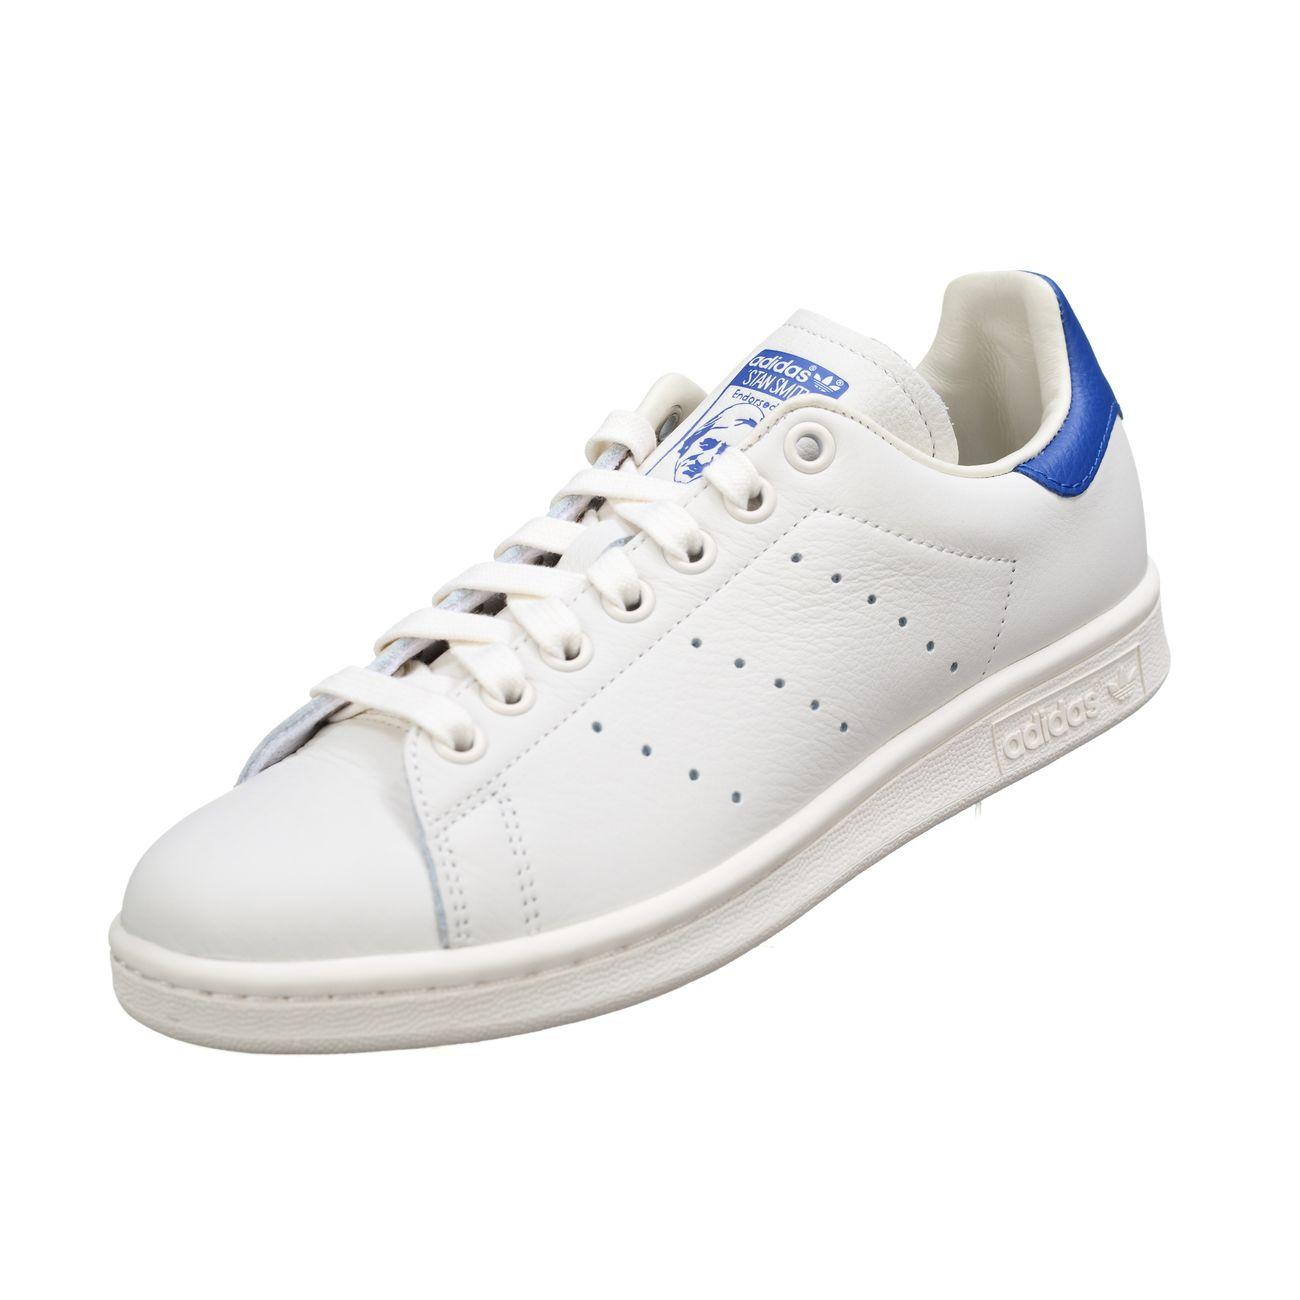 9b2d151cbe8 homme ADIDAS Basket Adidas Stan Smith B37899 Blanc Bleu